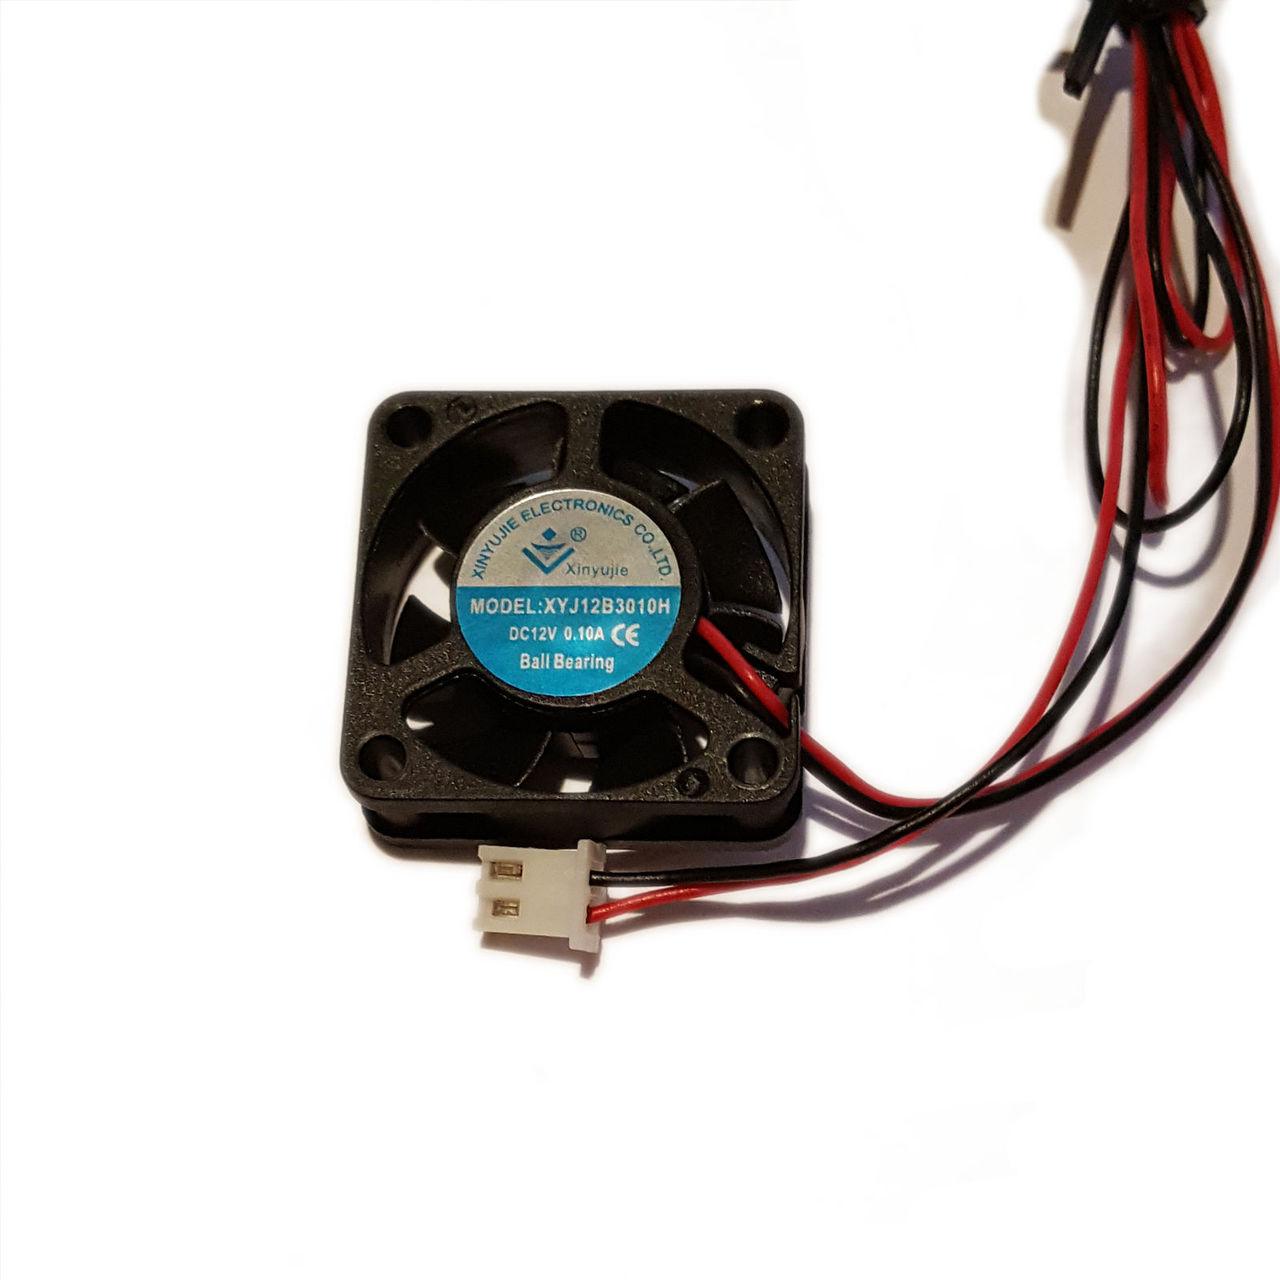 30mm x 30mm x 10mm Cooling Fan 3D Printing Canada